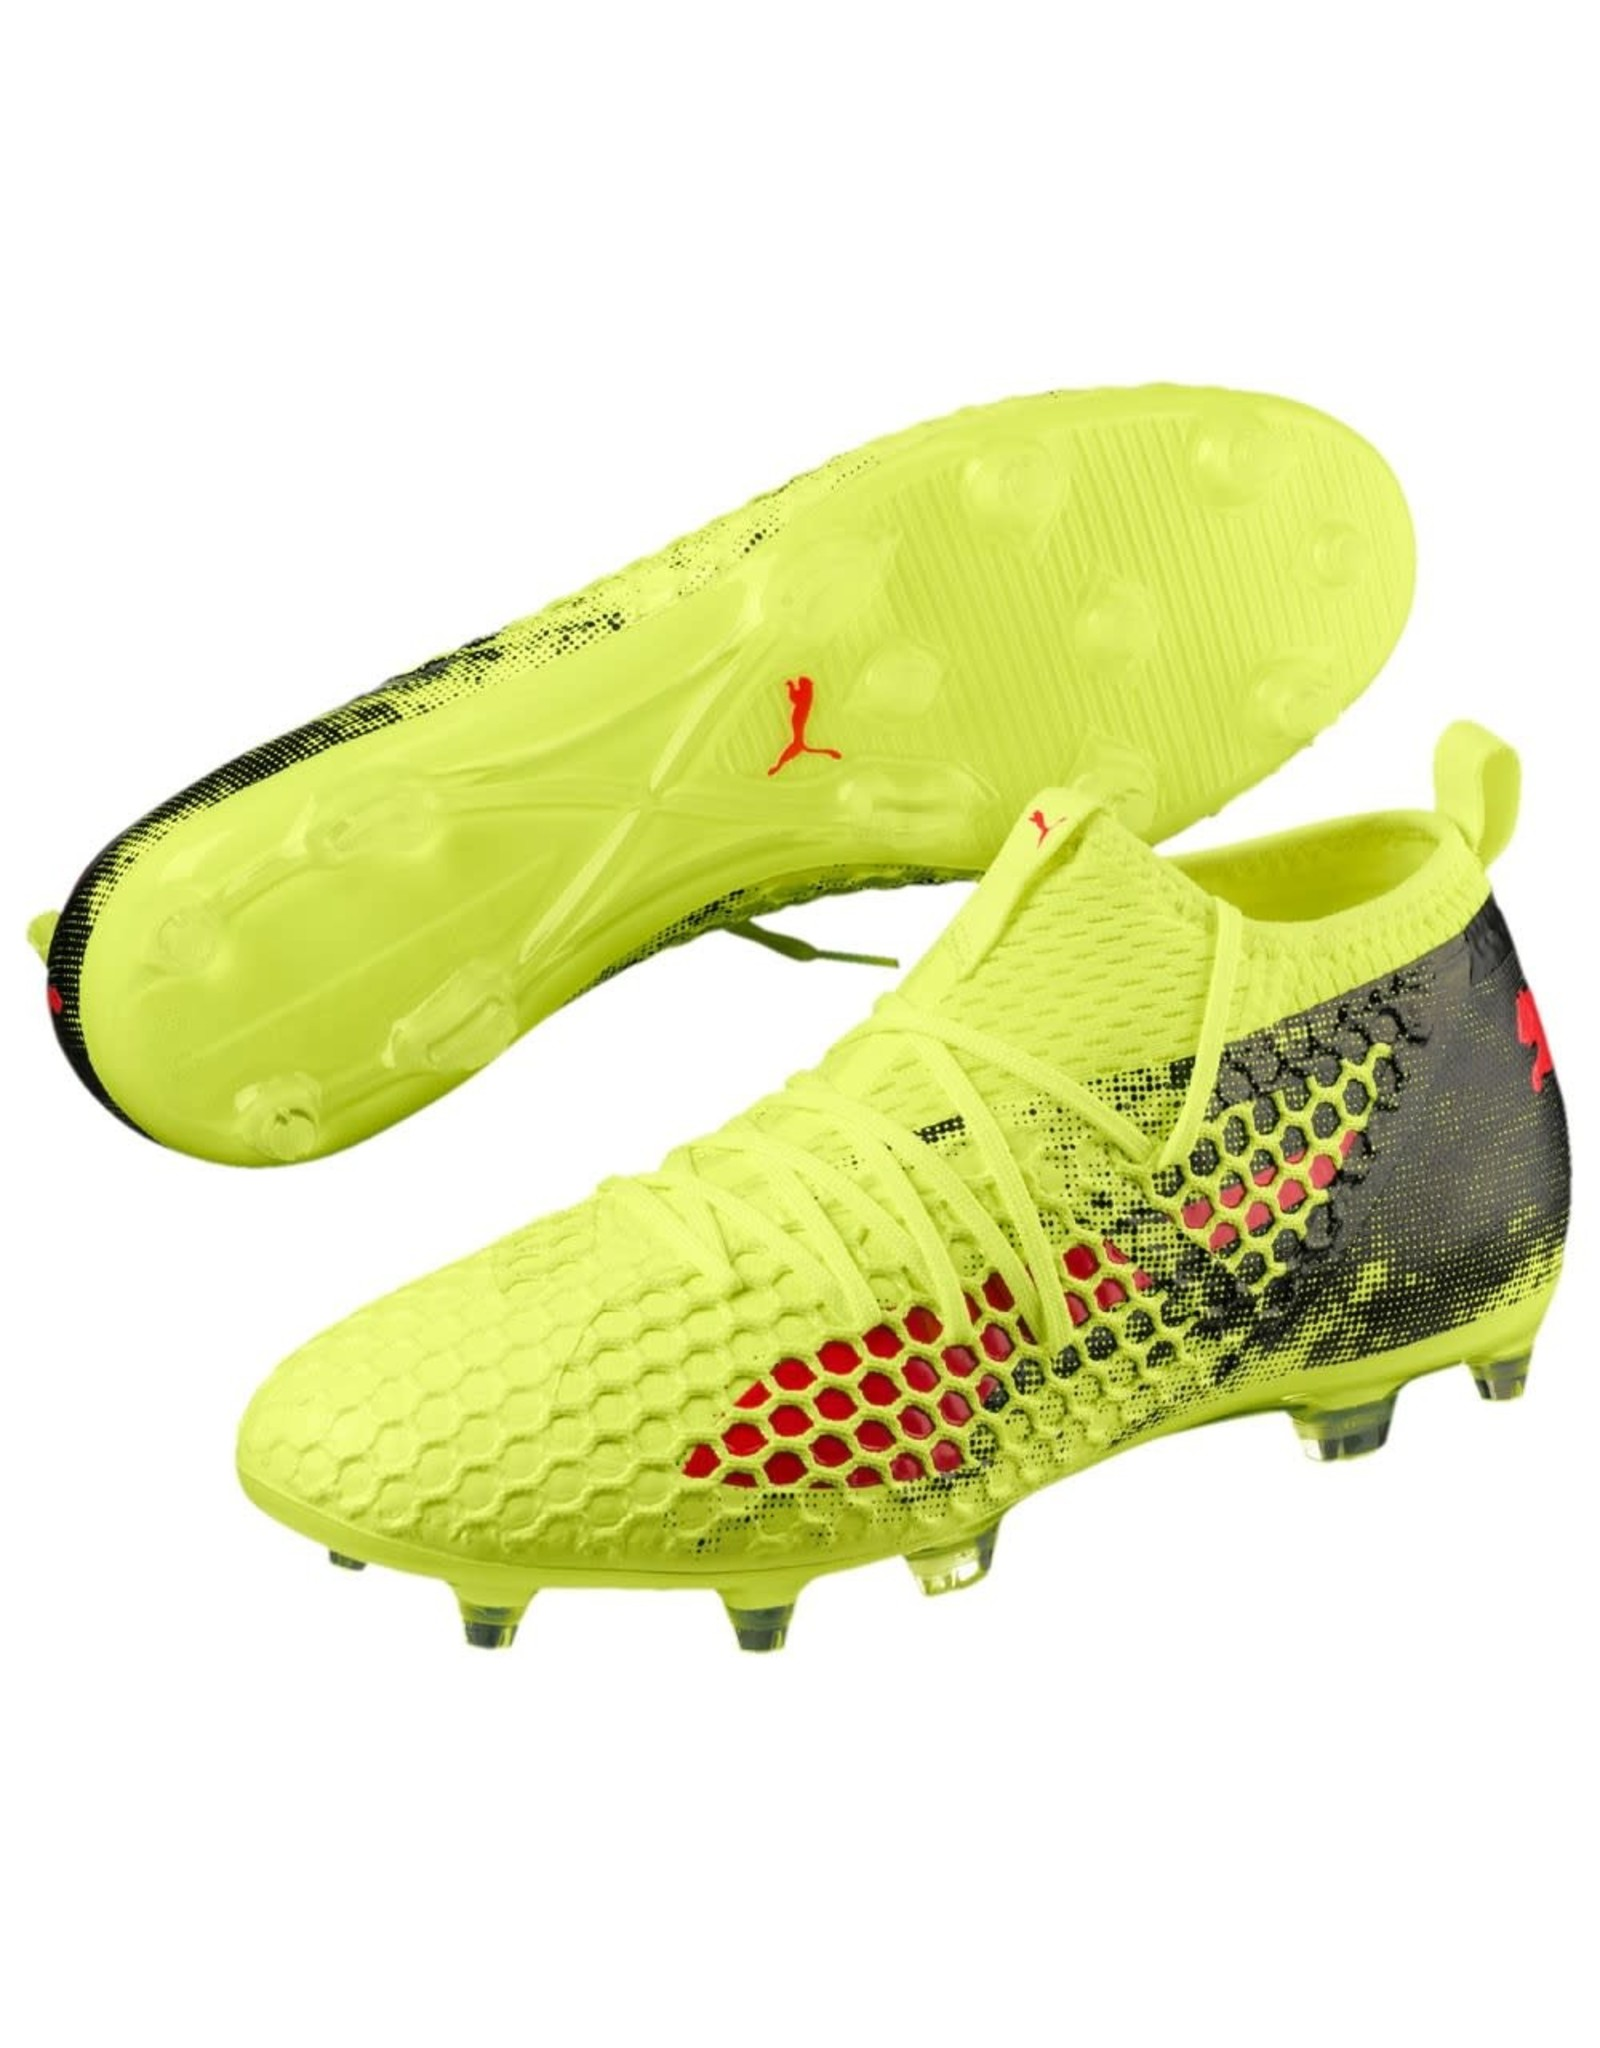 Puma Puma FUTURE 18.2 NETFIT FG/AG Cleats (Yellow/Red/Black)